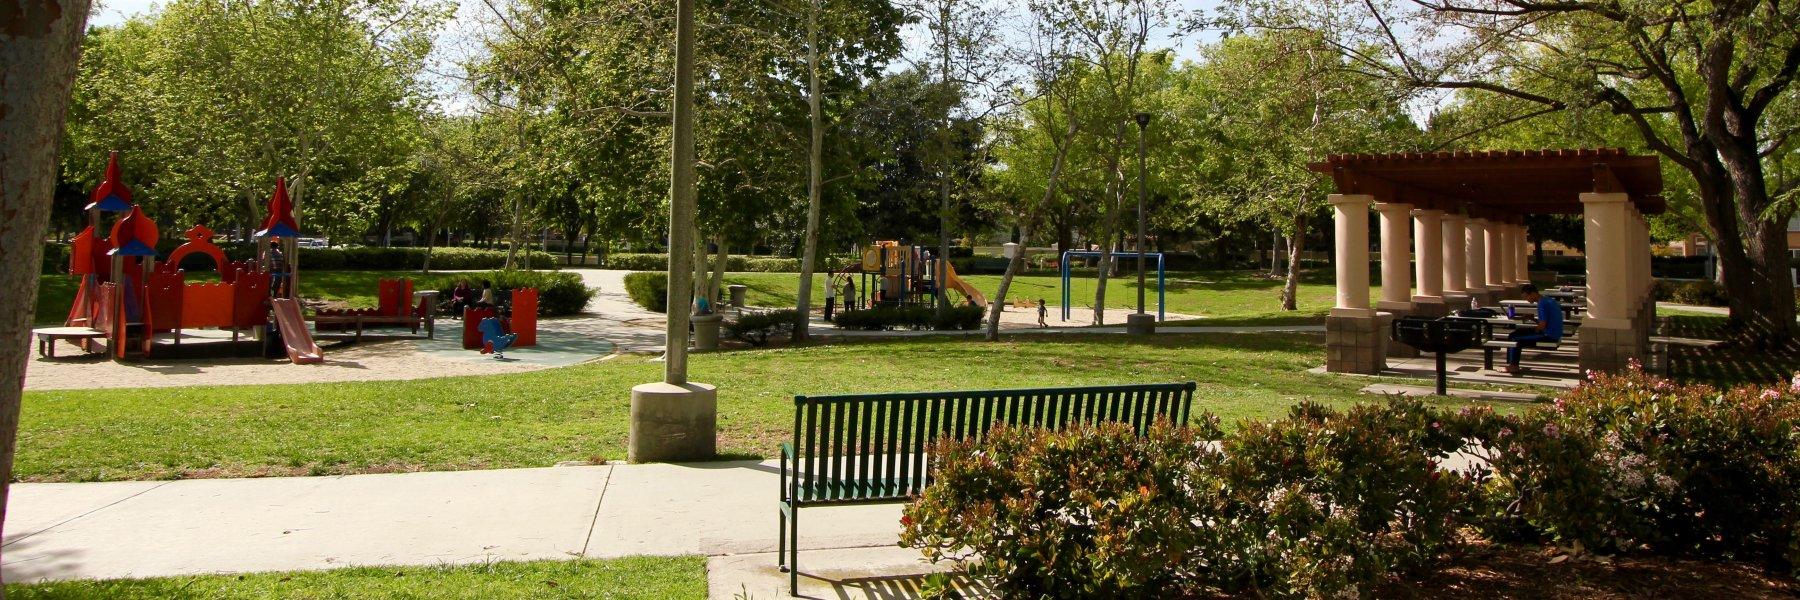 Westpark II is a community of homes in Irvine California